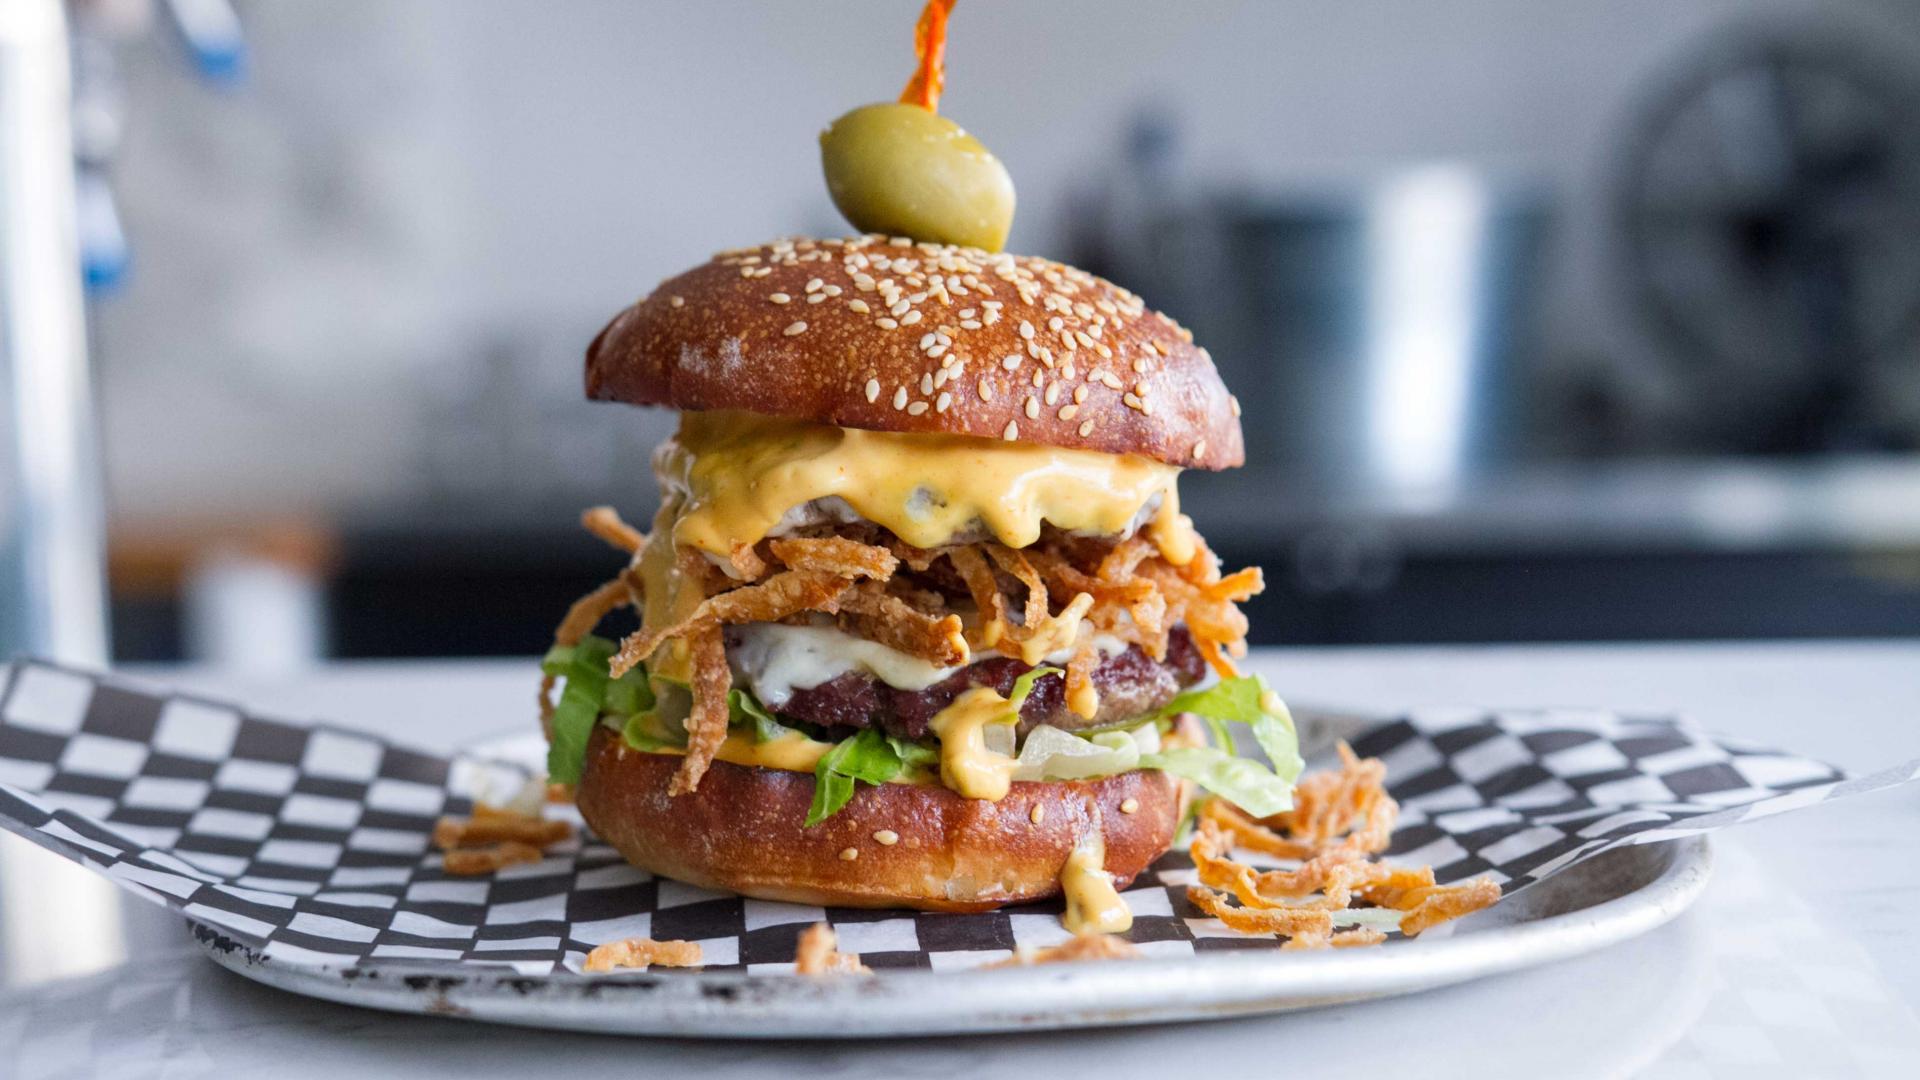 The best restaurants in Halifax: The Good Canteen